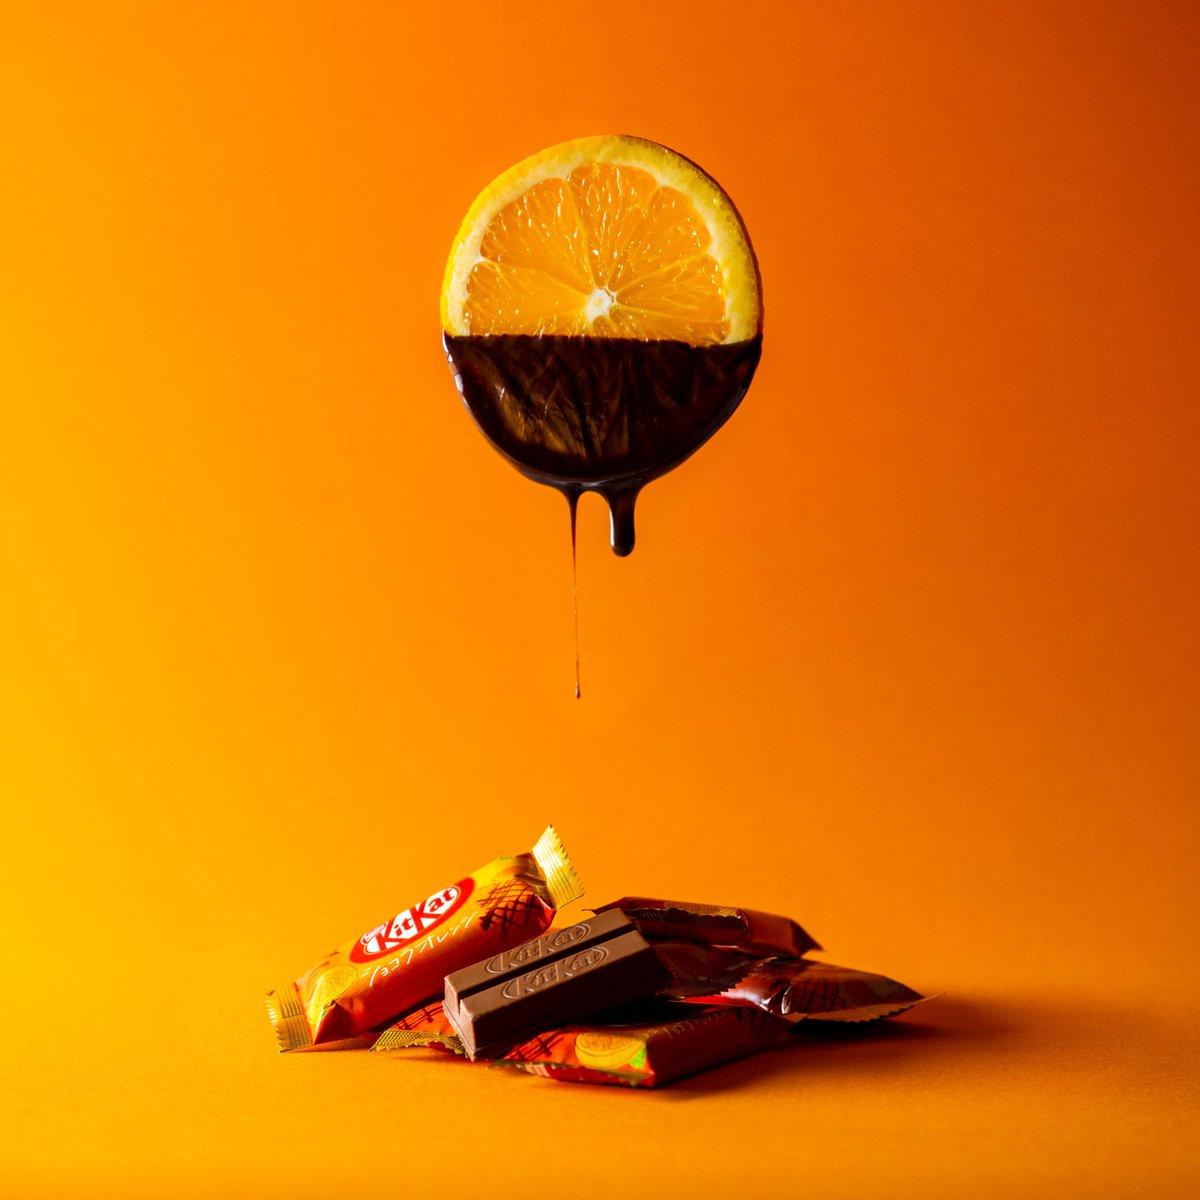 NUEVOS Kit Kat en Japonshop! Naranja-chocolate y Helado-barquillo!